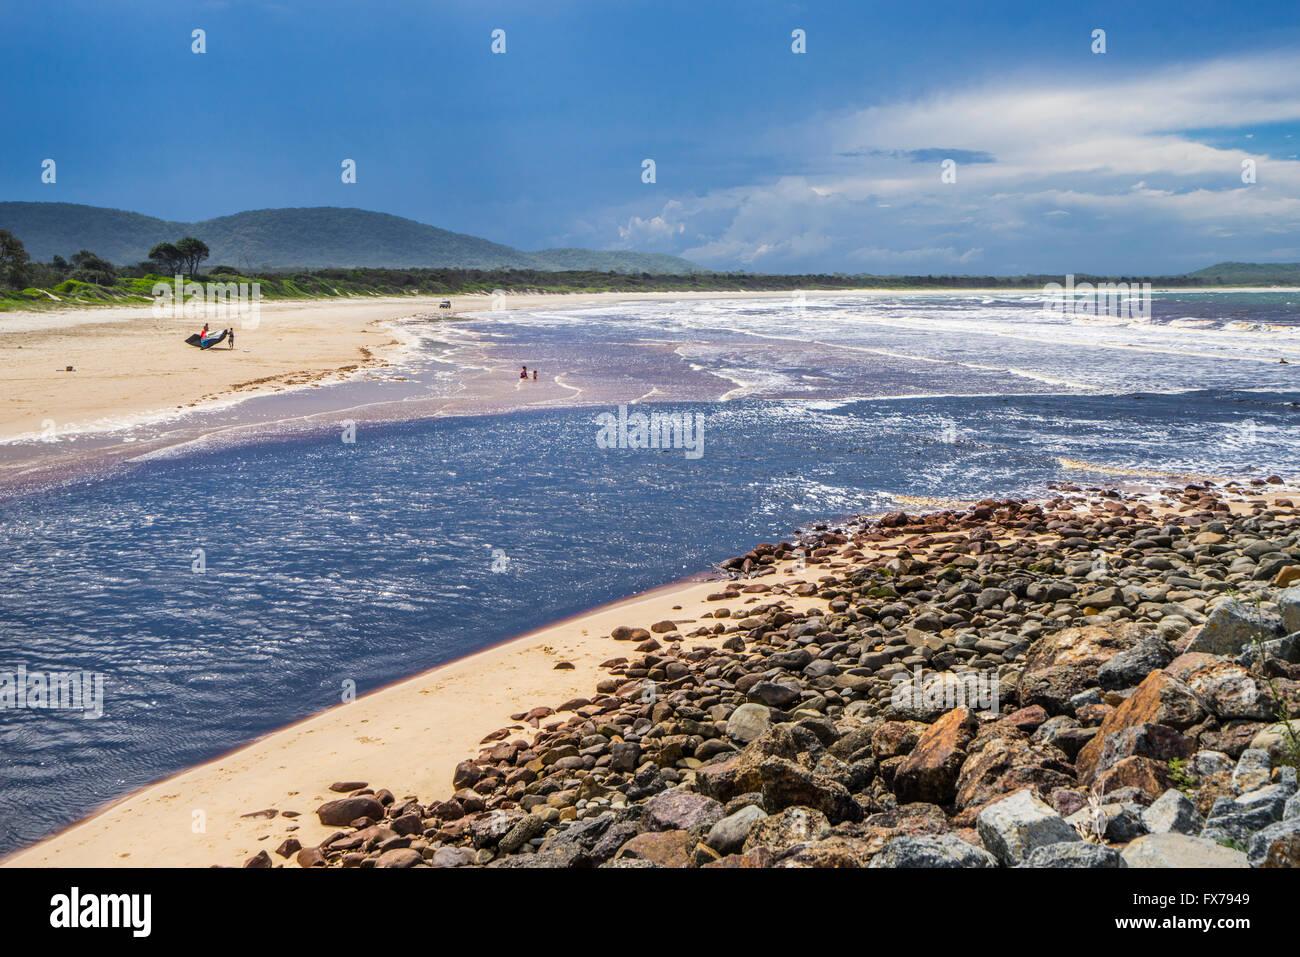 Australia, New South Wales, Mid North Coast region, Crescent Head, view of Killick Creek - Stock Image